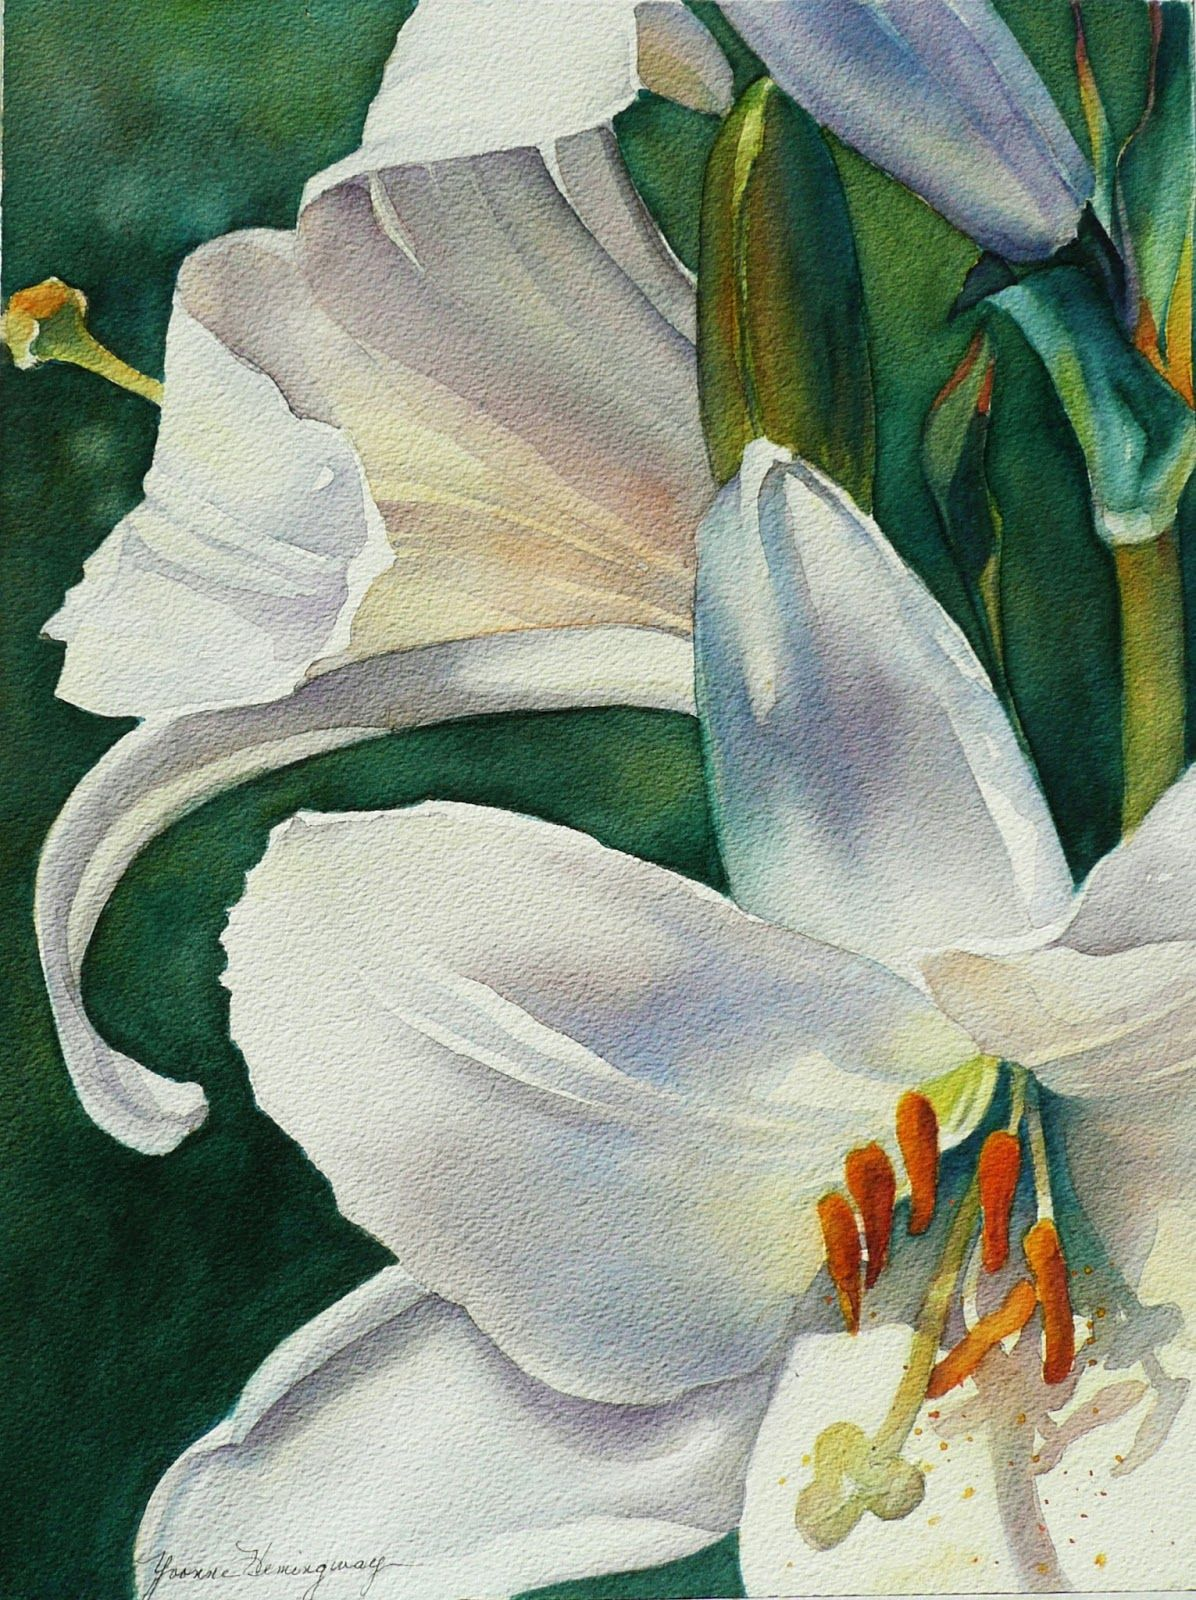 Polly Seip Fine Art: Artist on Artist Interview with Yvonne Hemingway